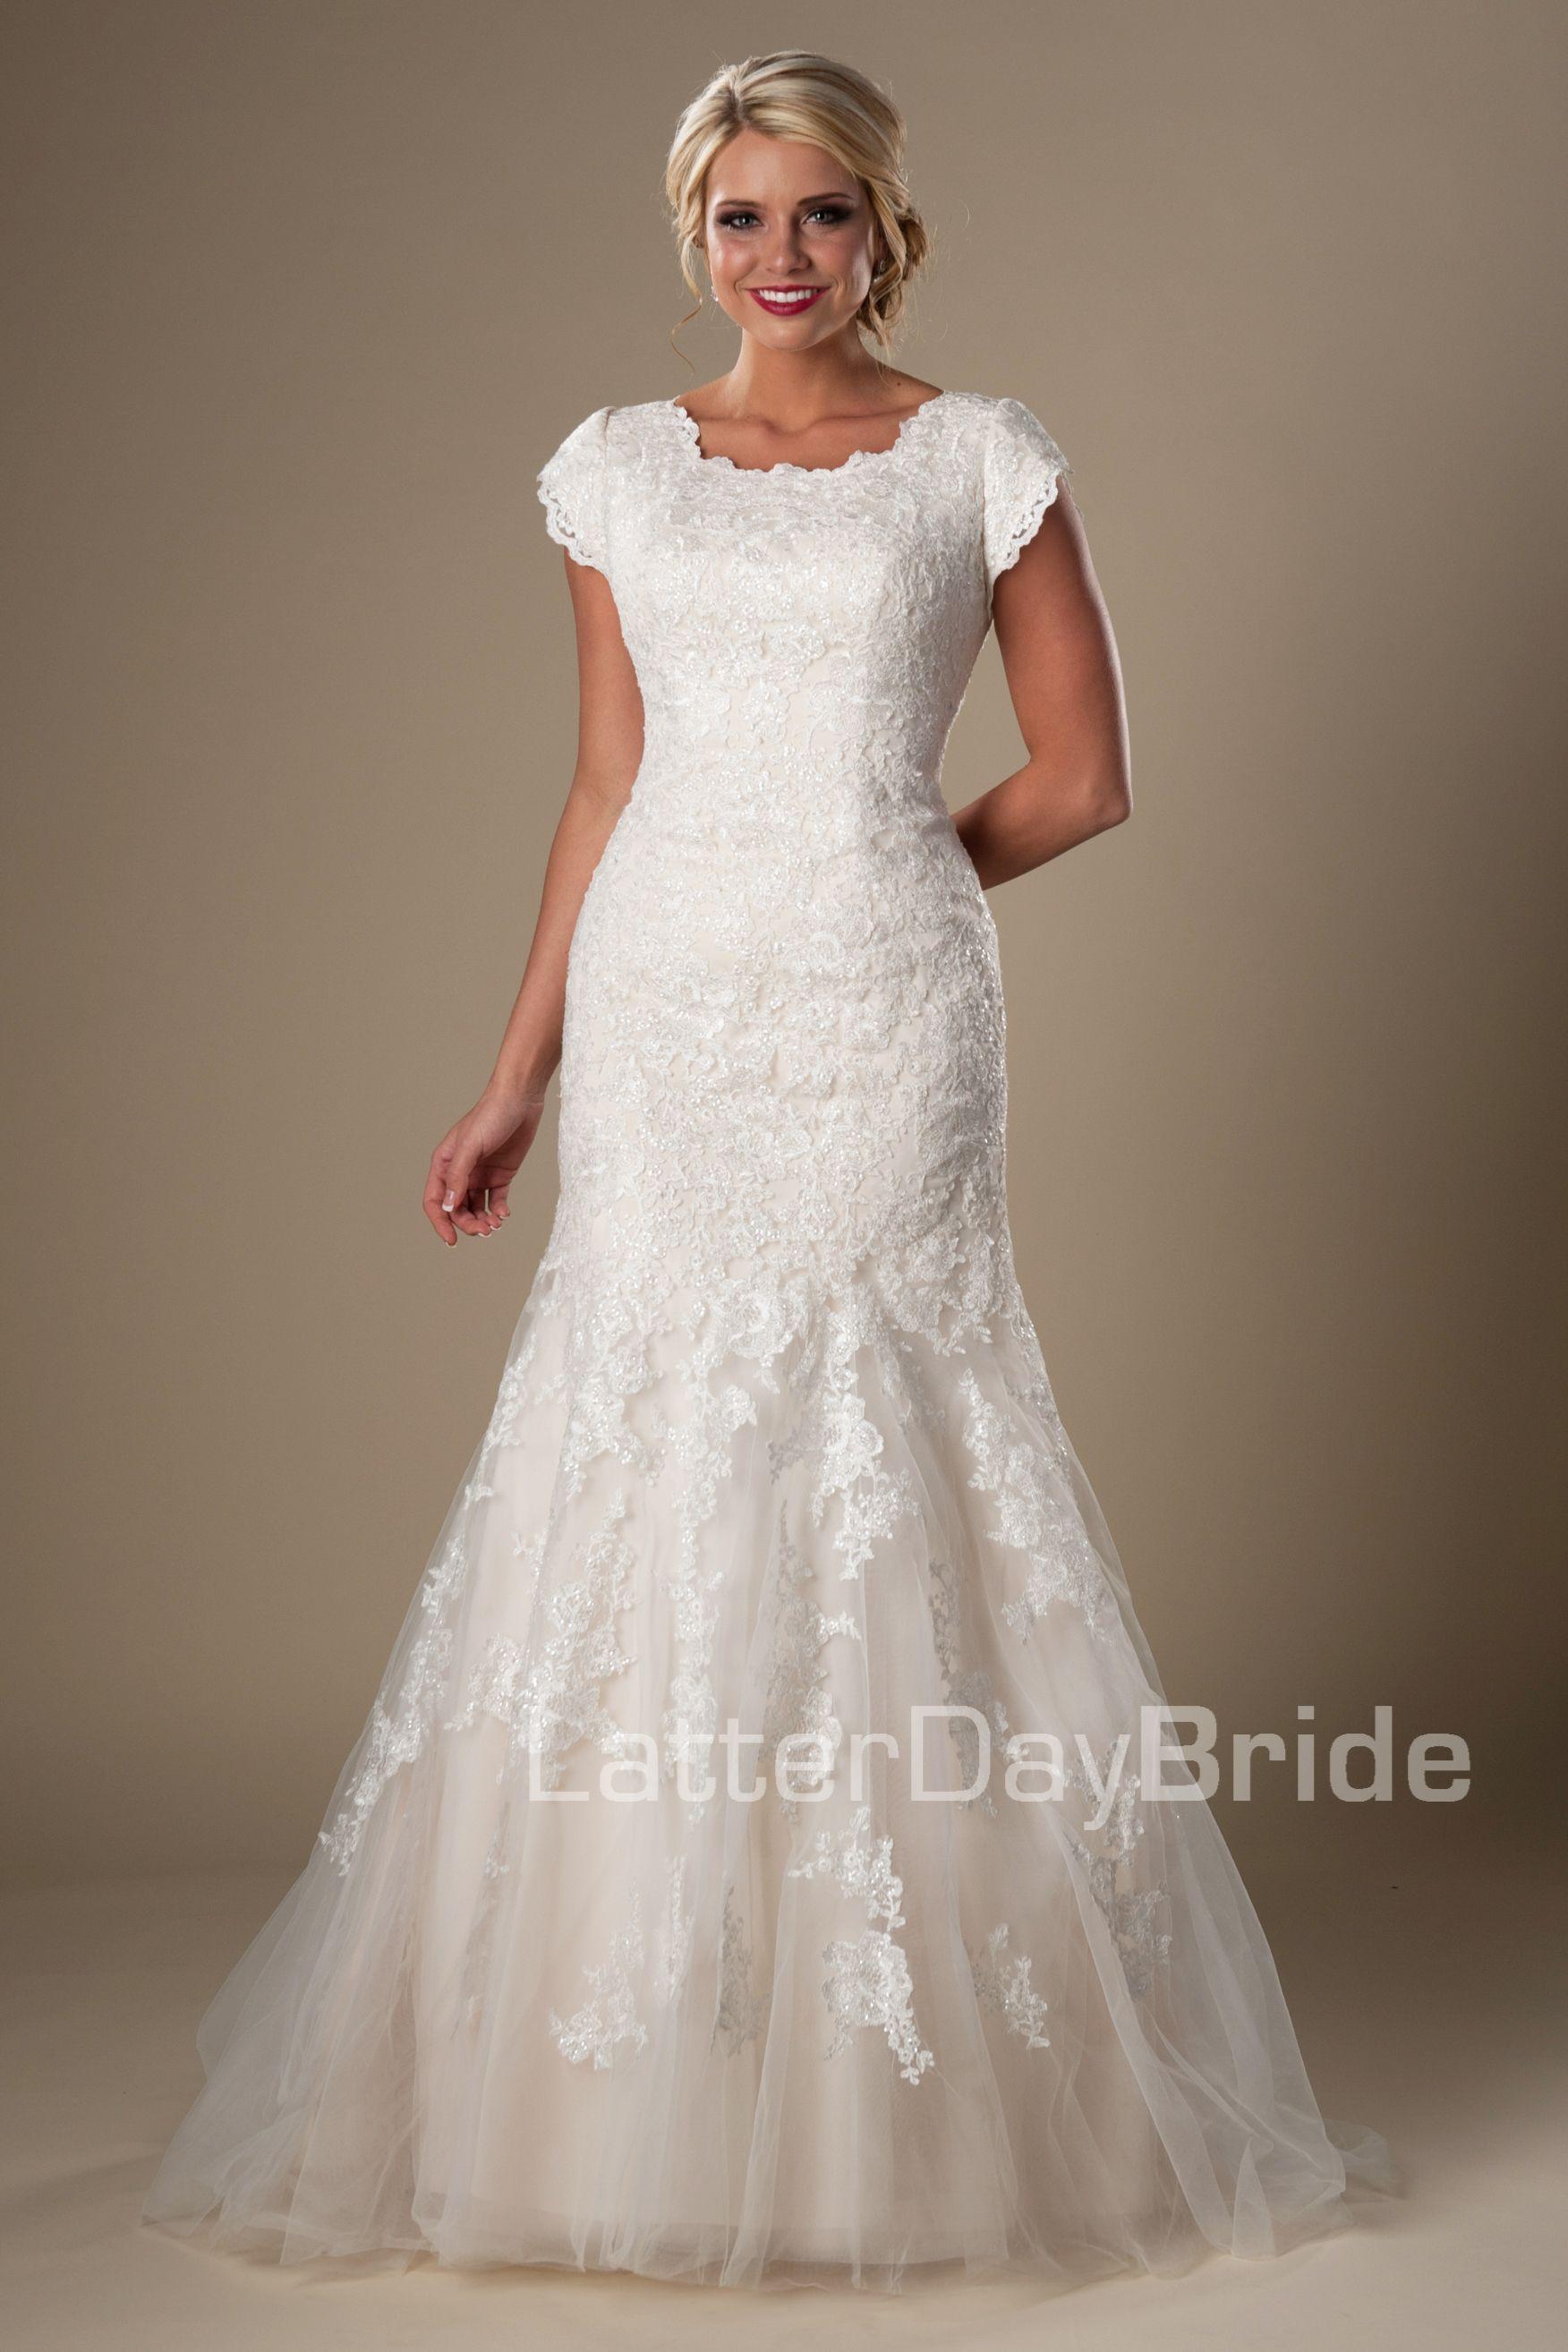 Berkeley | Modest lace wedding dress | LatterDayBride & Prom | LDS ...